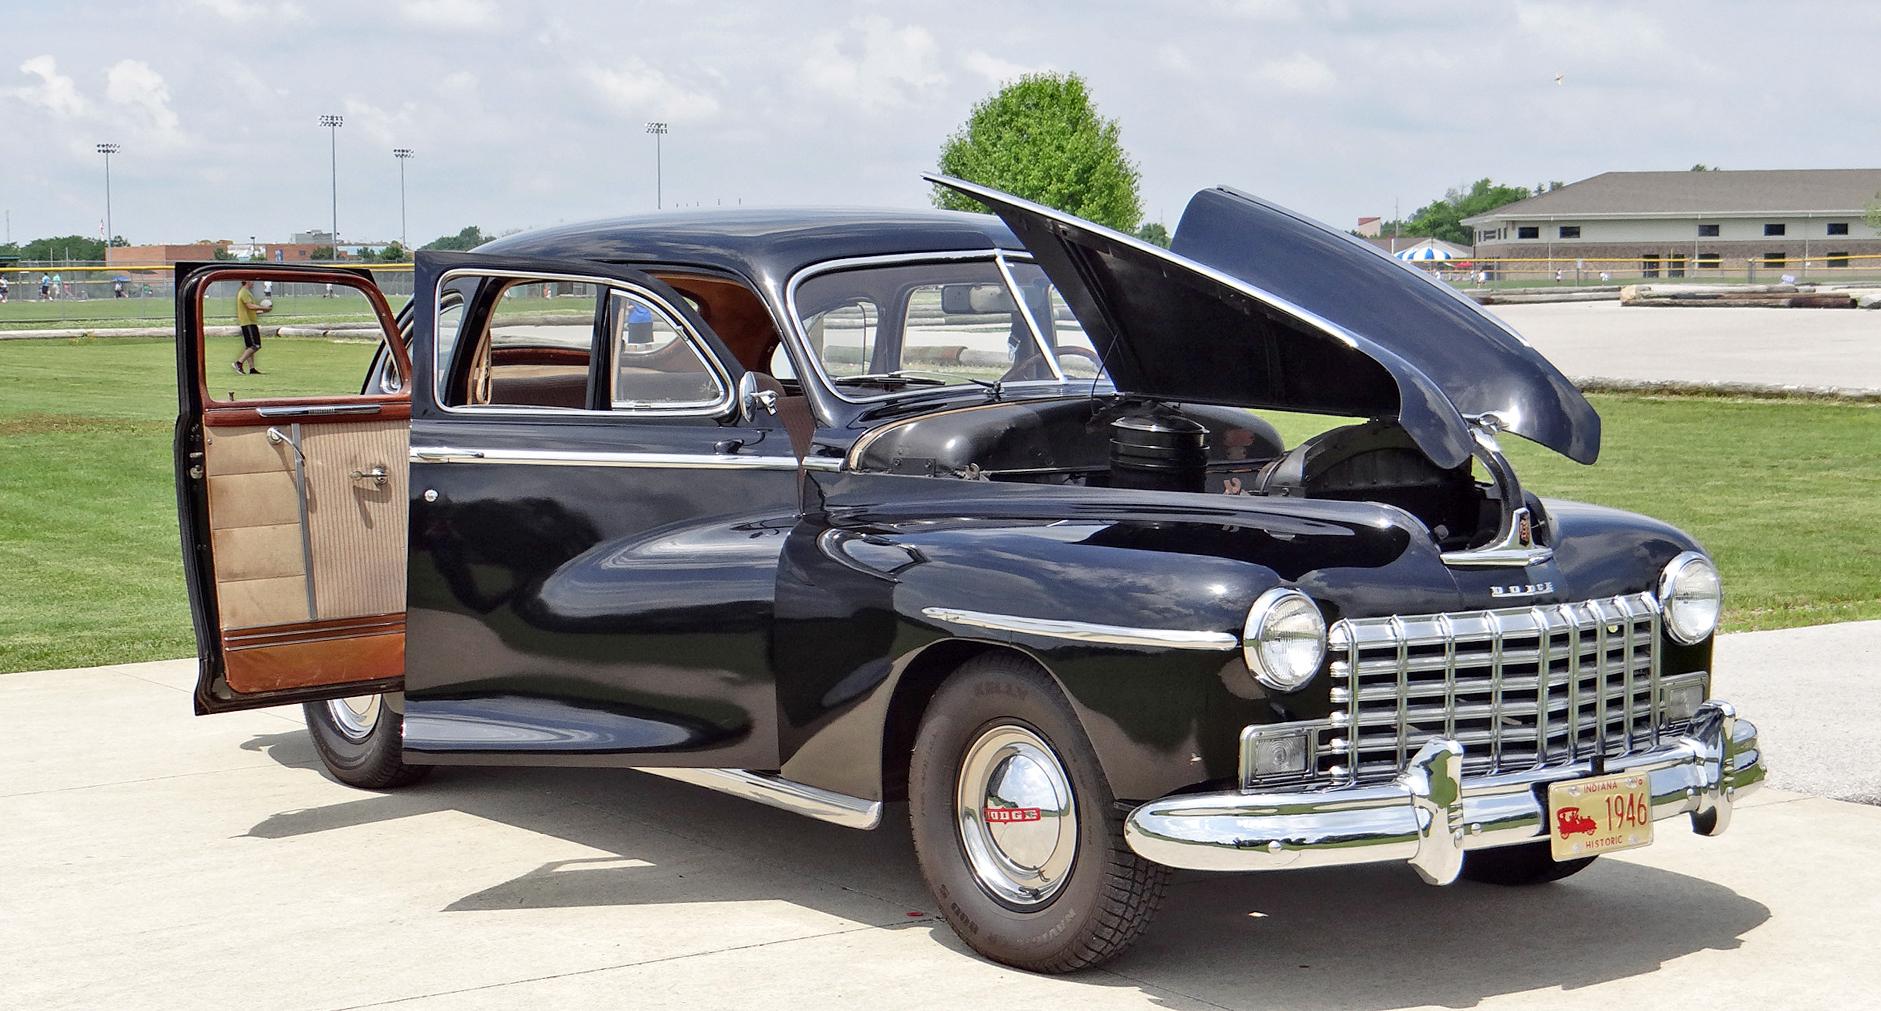 File1946 Dodge D24C 4-Door Sedan Suicide Doors \u0026 Gullwing Hood 262. & File:1946 Dodge D24C 4-Door Sedan Suicide Doors \u0026 Gullwing Hood 262 ...